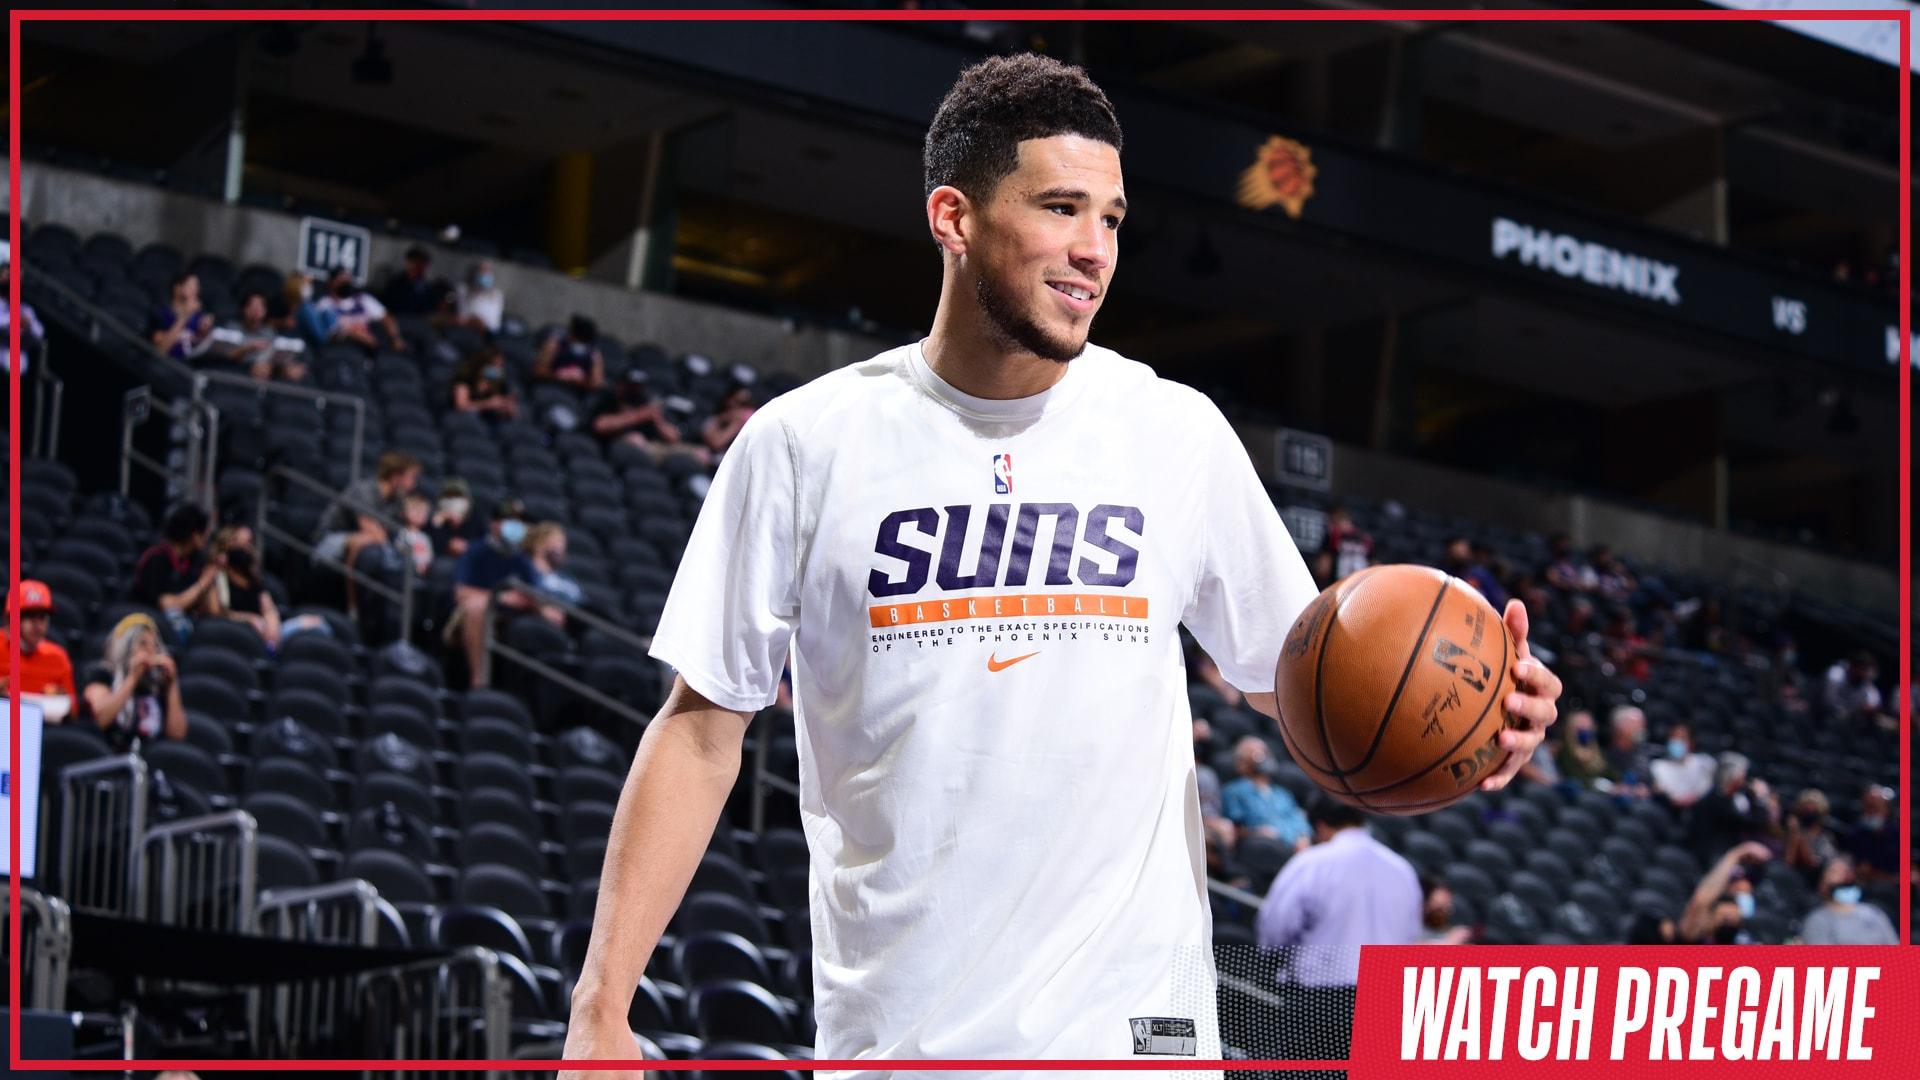 Watch Free: Suns vs. Hawks Pregame